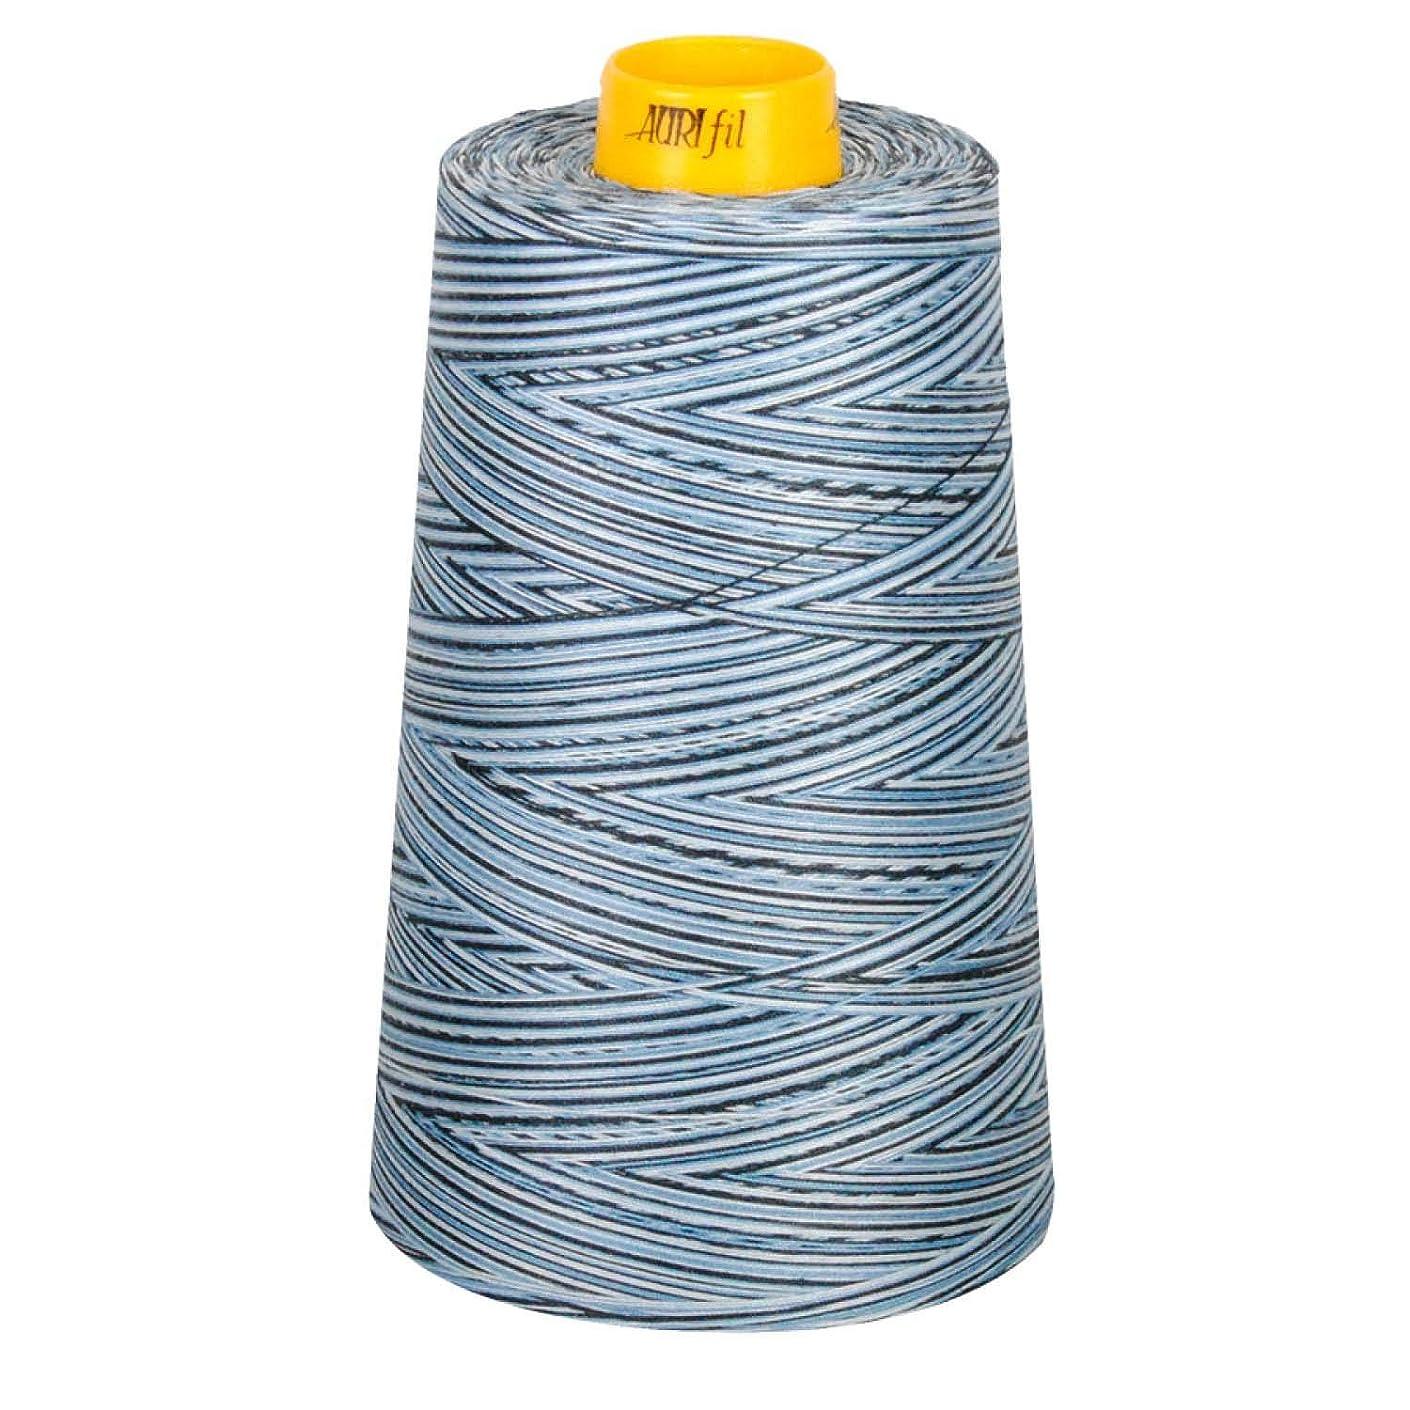 Aurifil MK403CO4669 Mako Cotton 3-ply Longarm 40wt 3280yds Stonewash Blues Thread